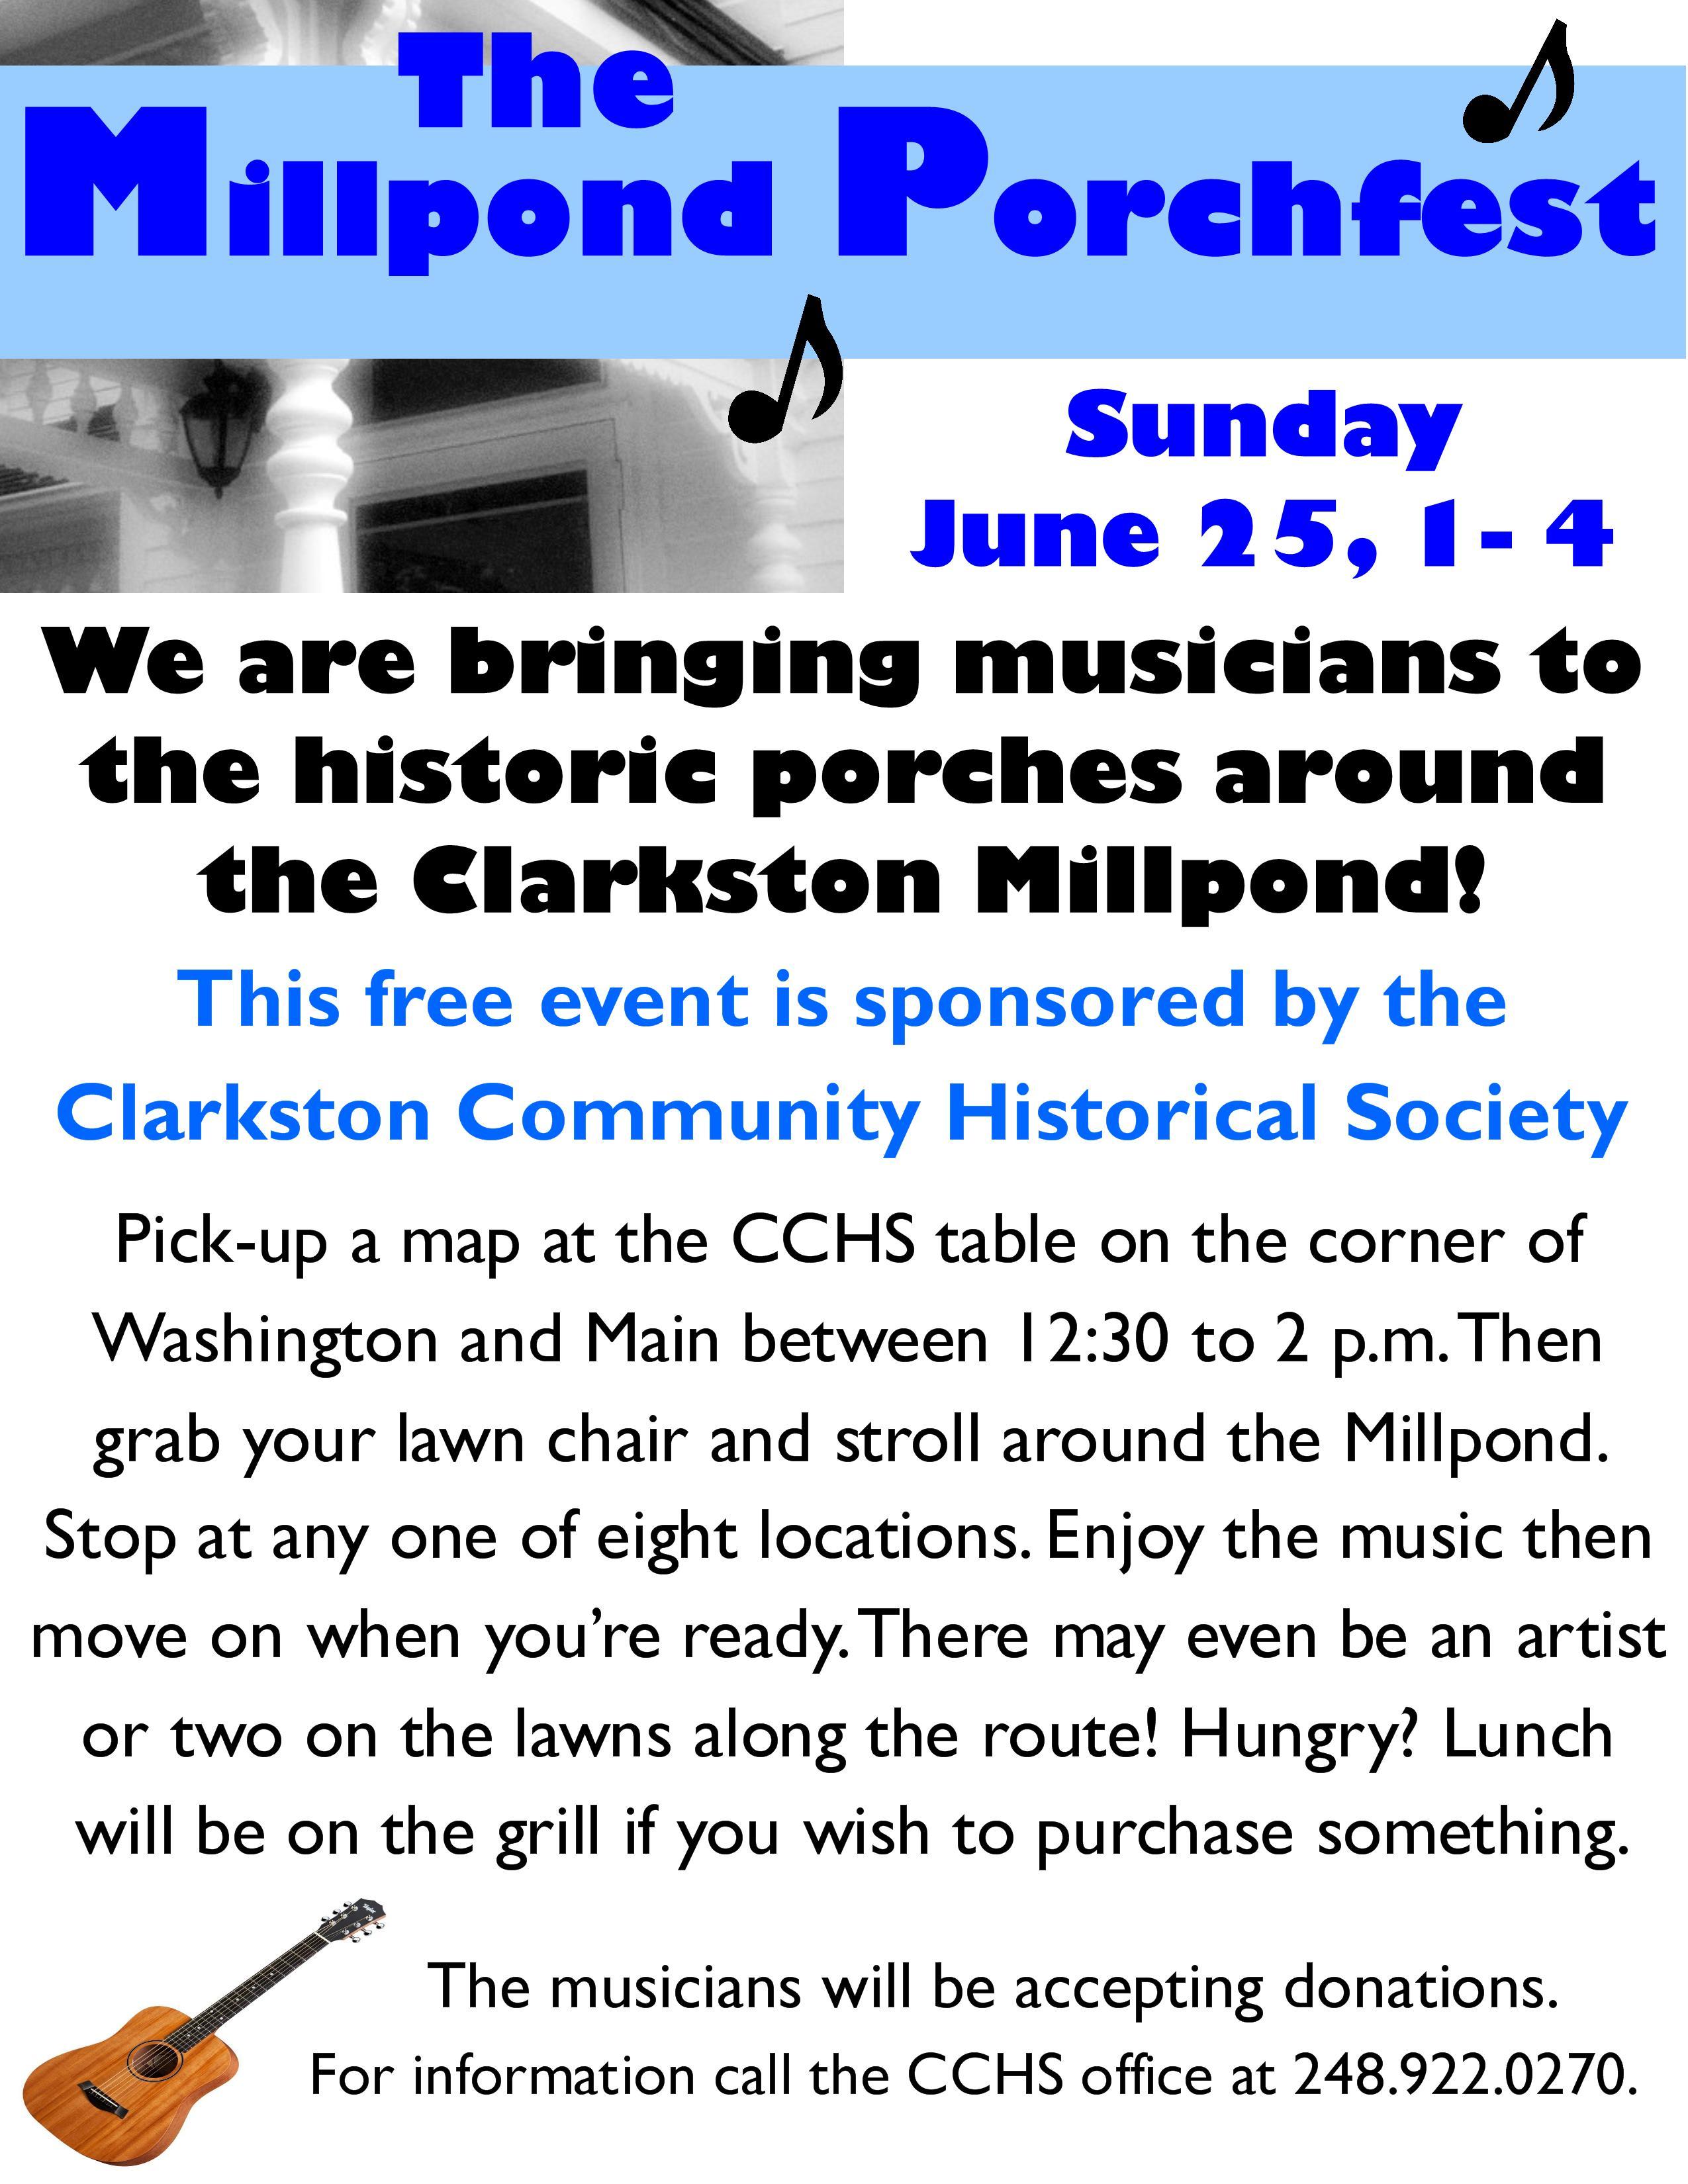 Millpond porchfest flyer Facebook